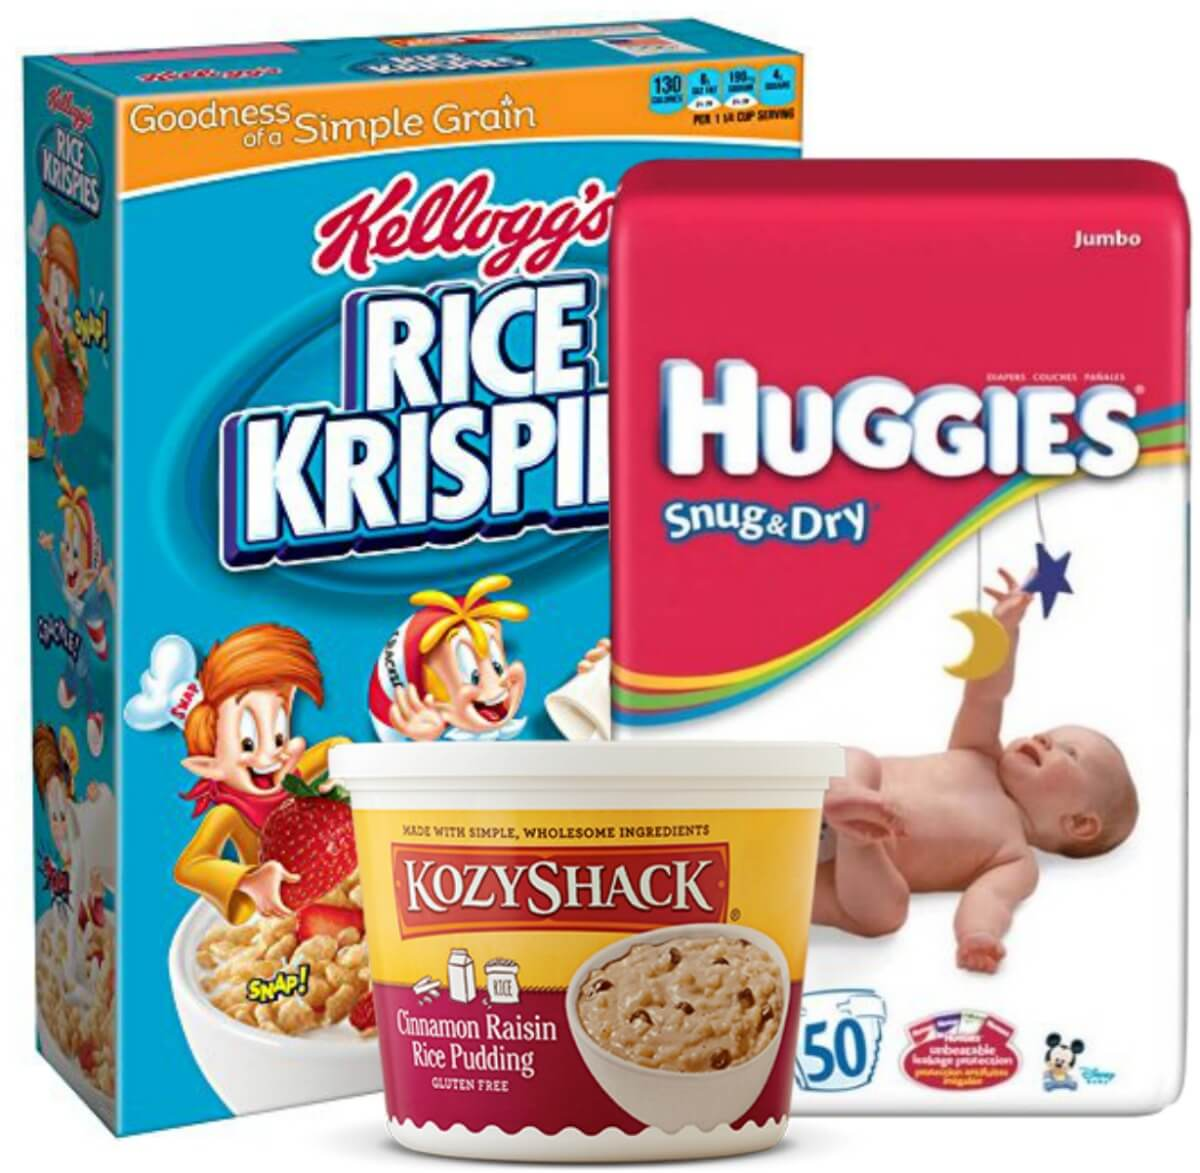 Today's Top New Coupons - Save on Kellogg's, Huggies, Kozy Shack & More